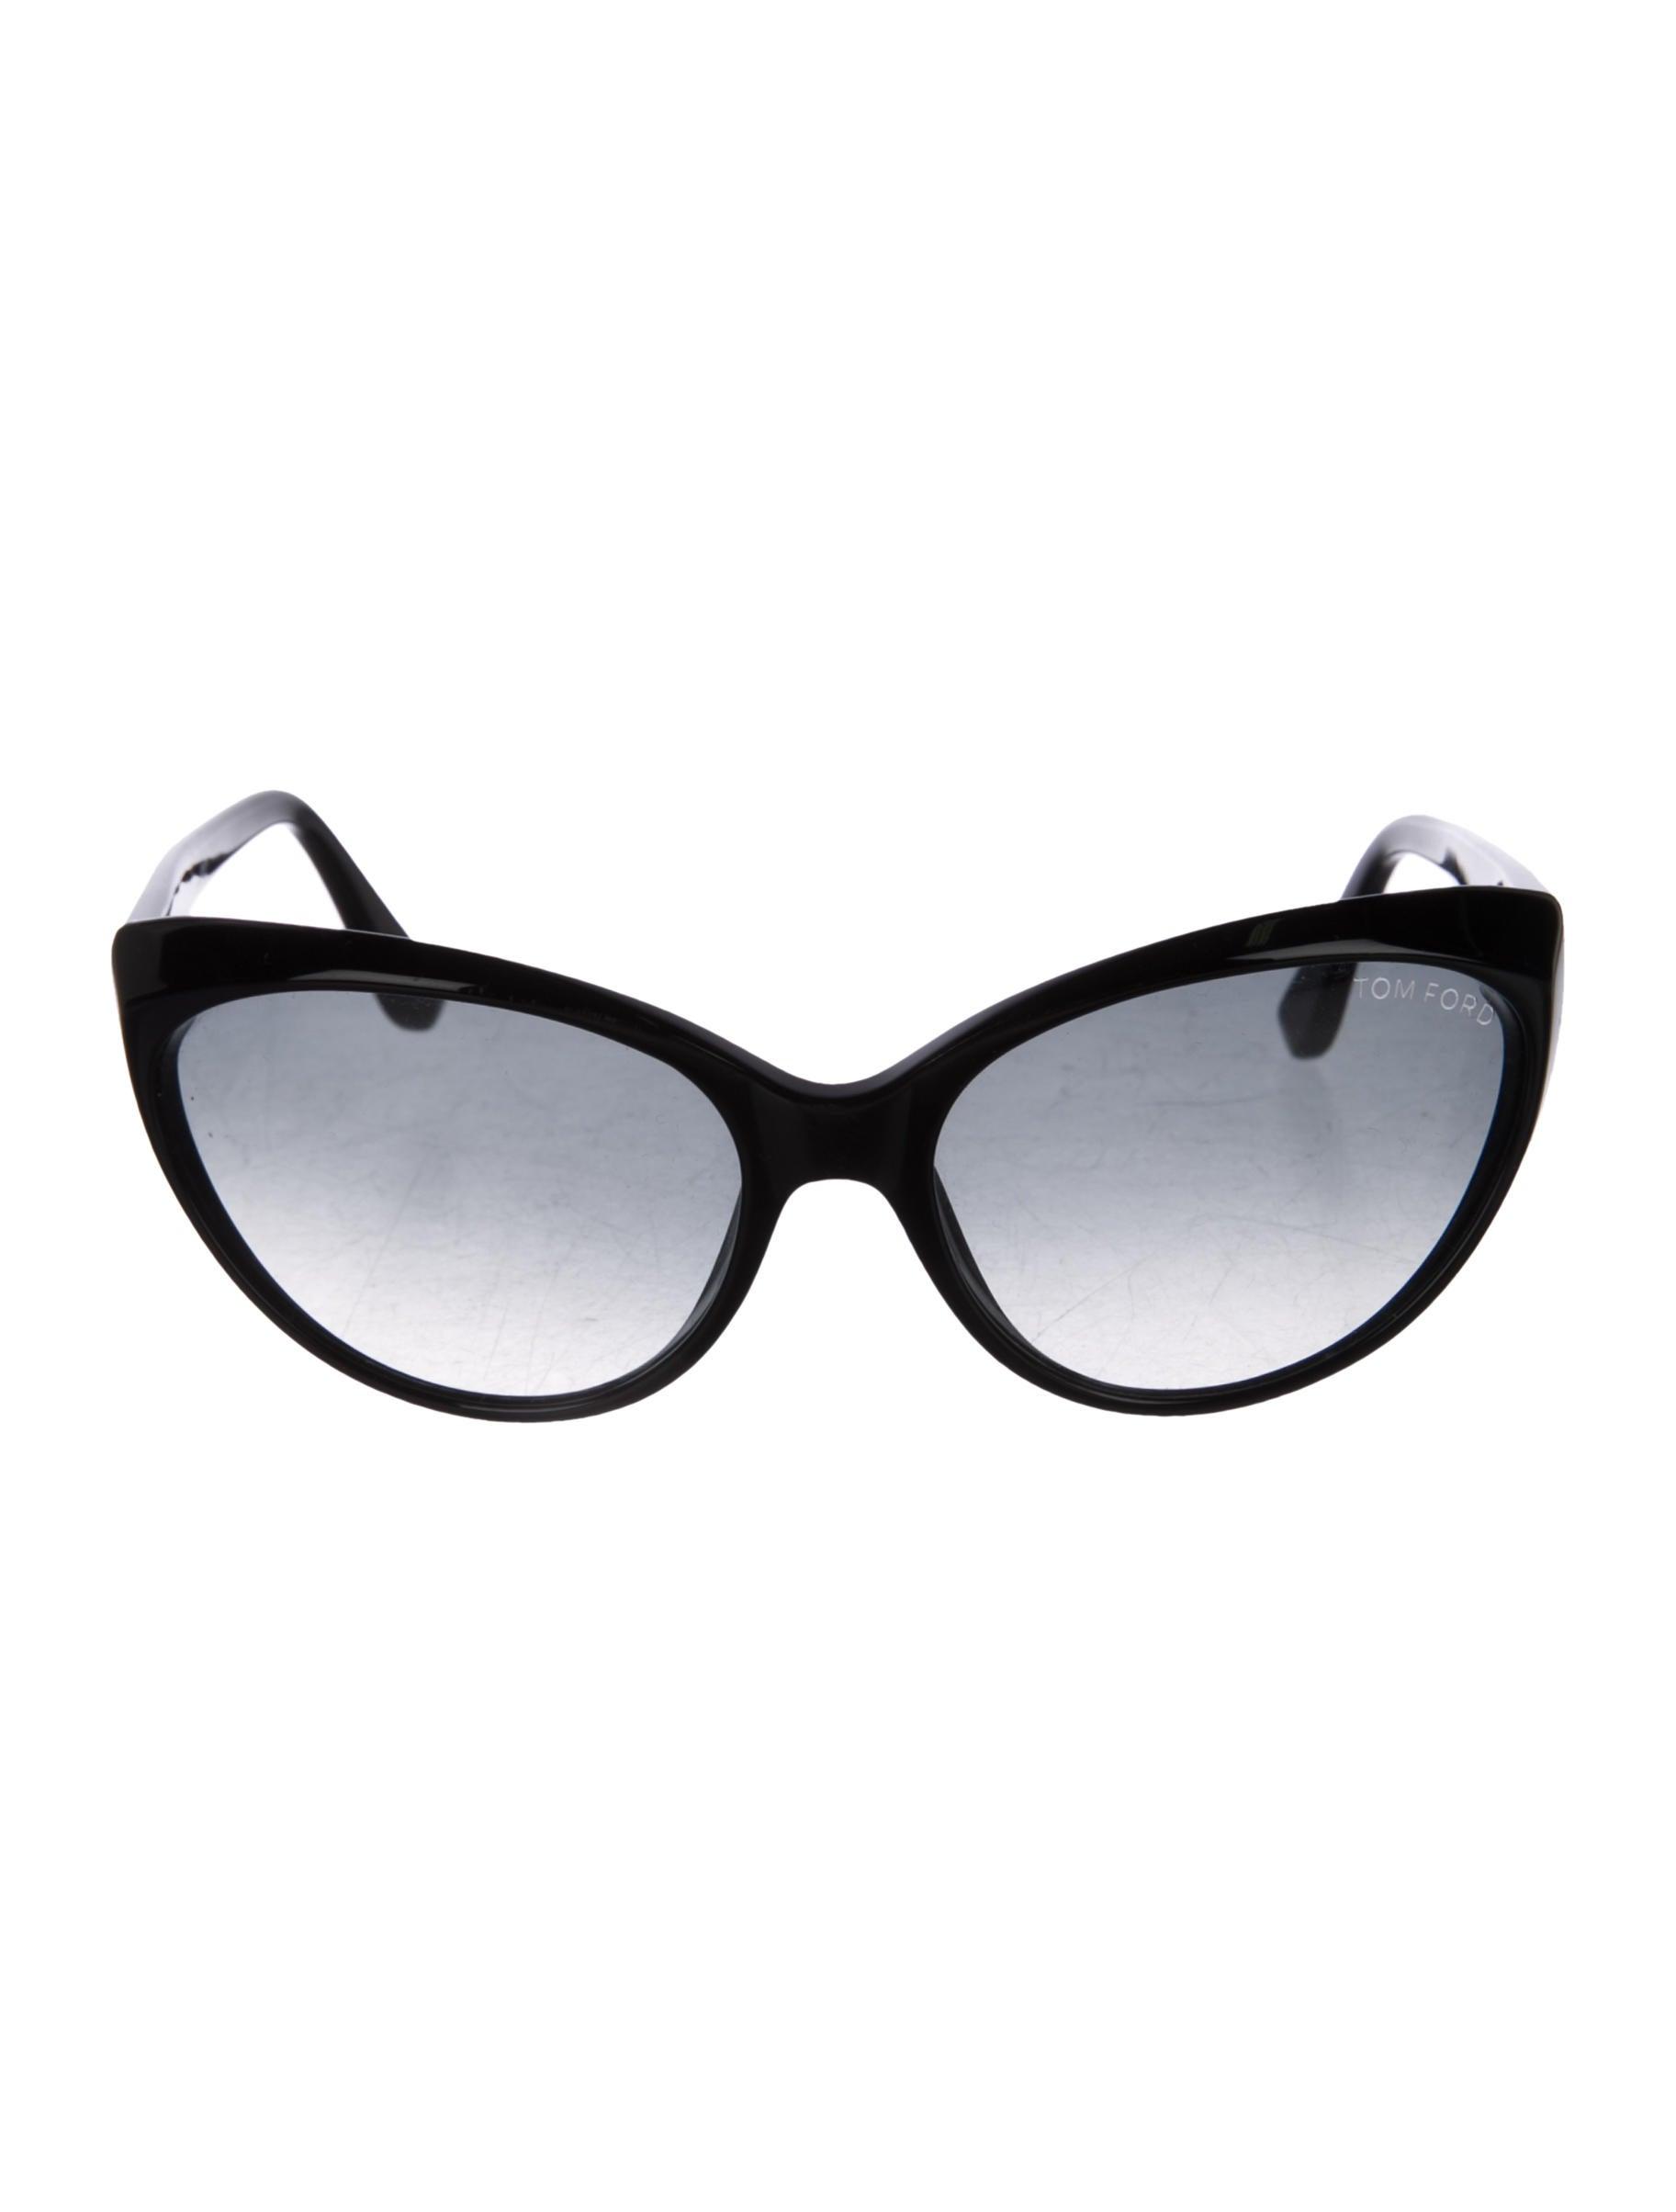 93d3a68df9629 Tom Ford Martina Cat-Eye Sunglasses - Accessories - TOM48501